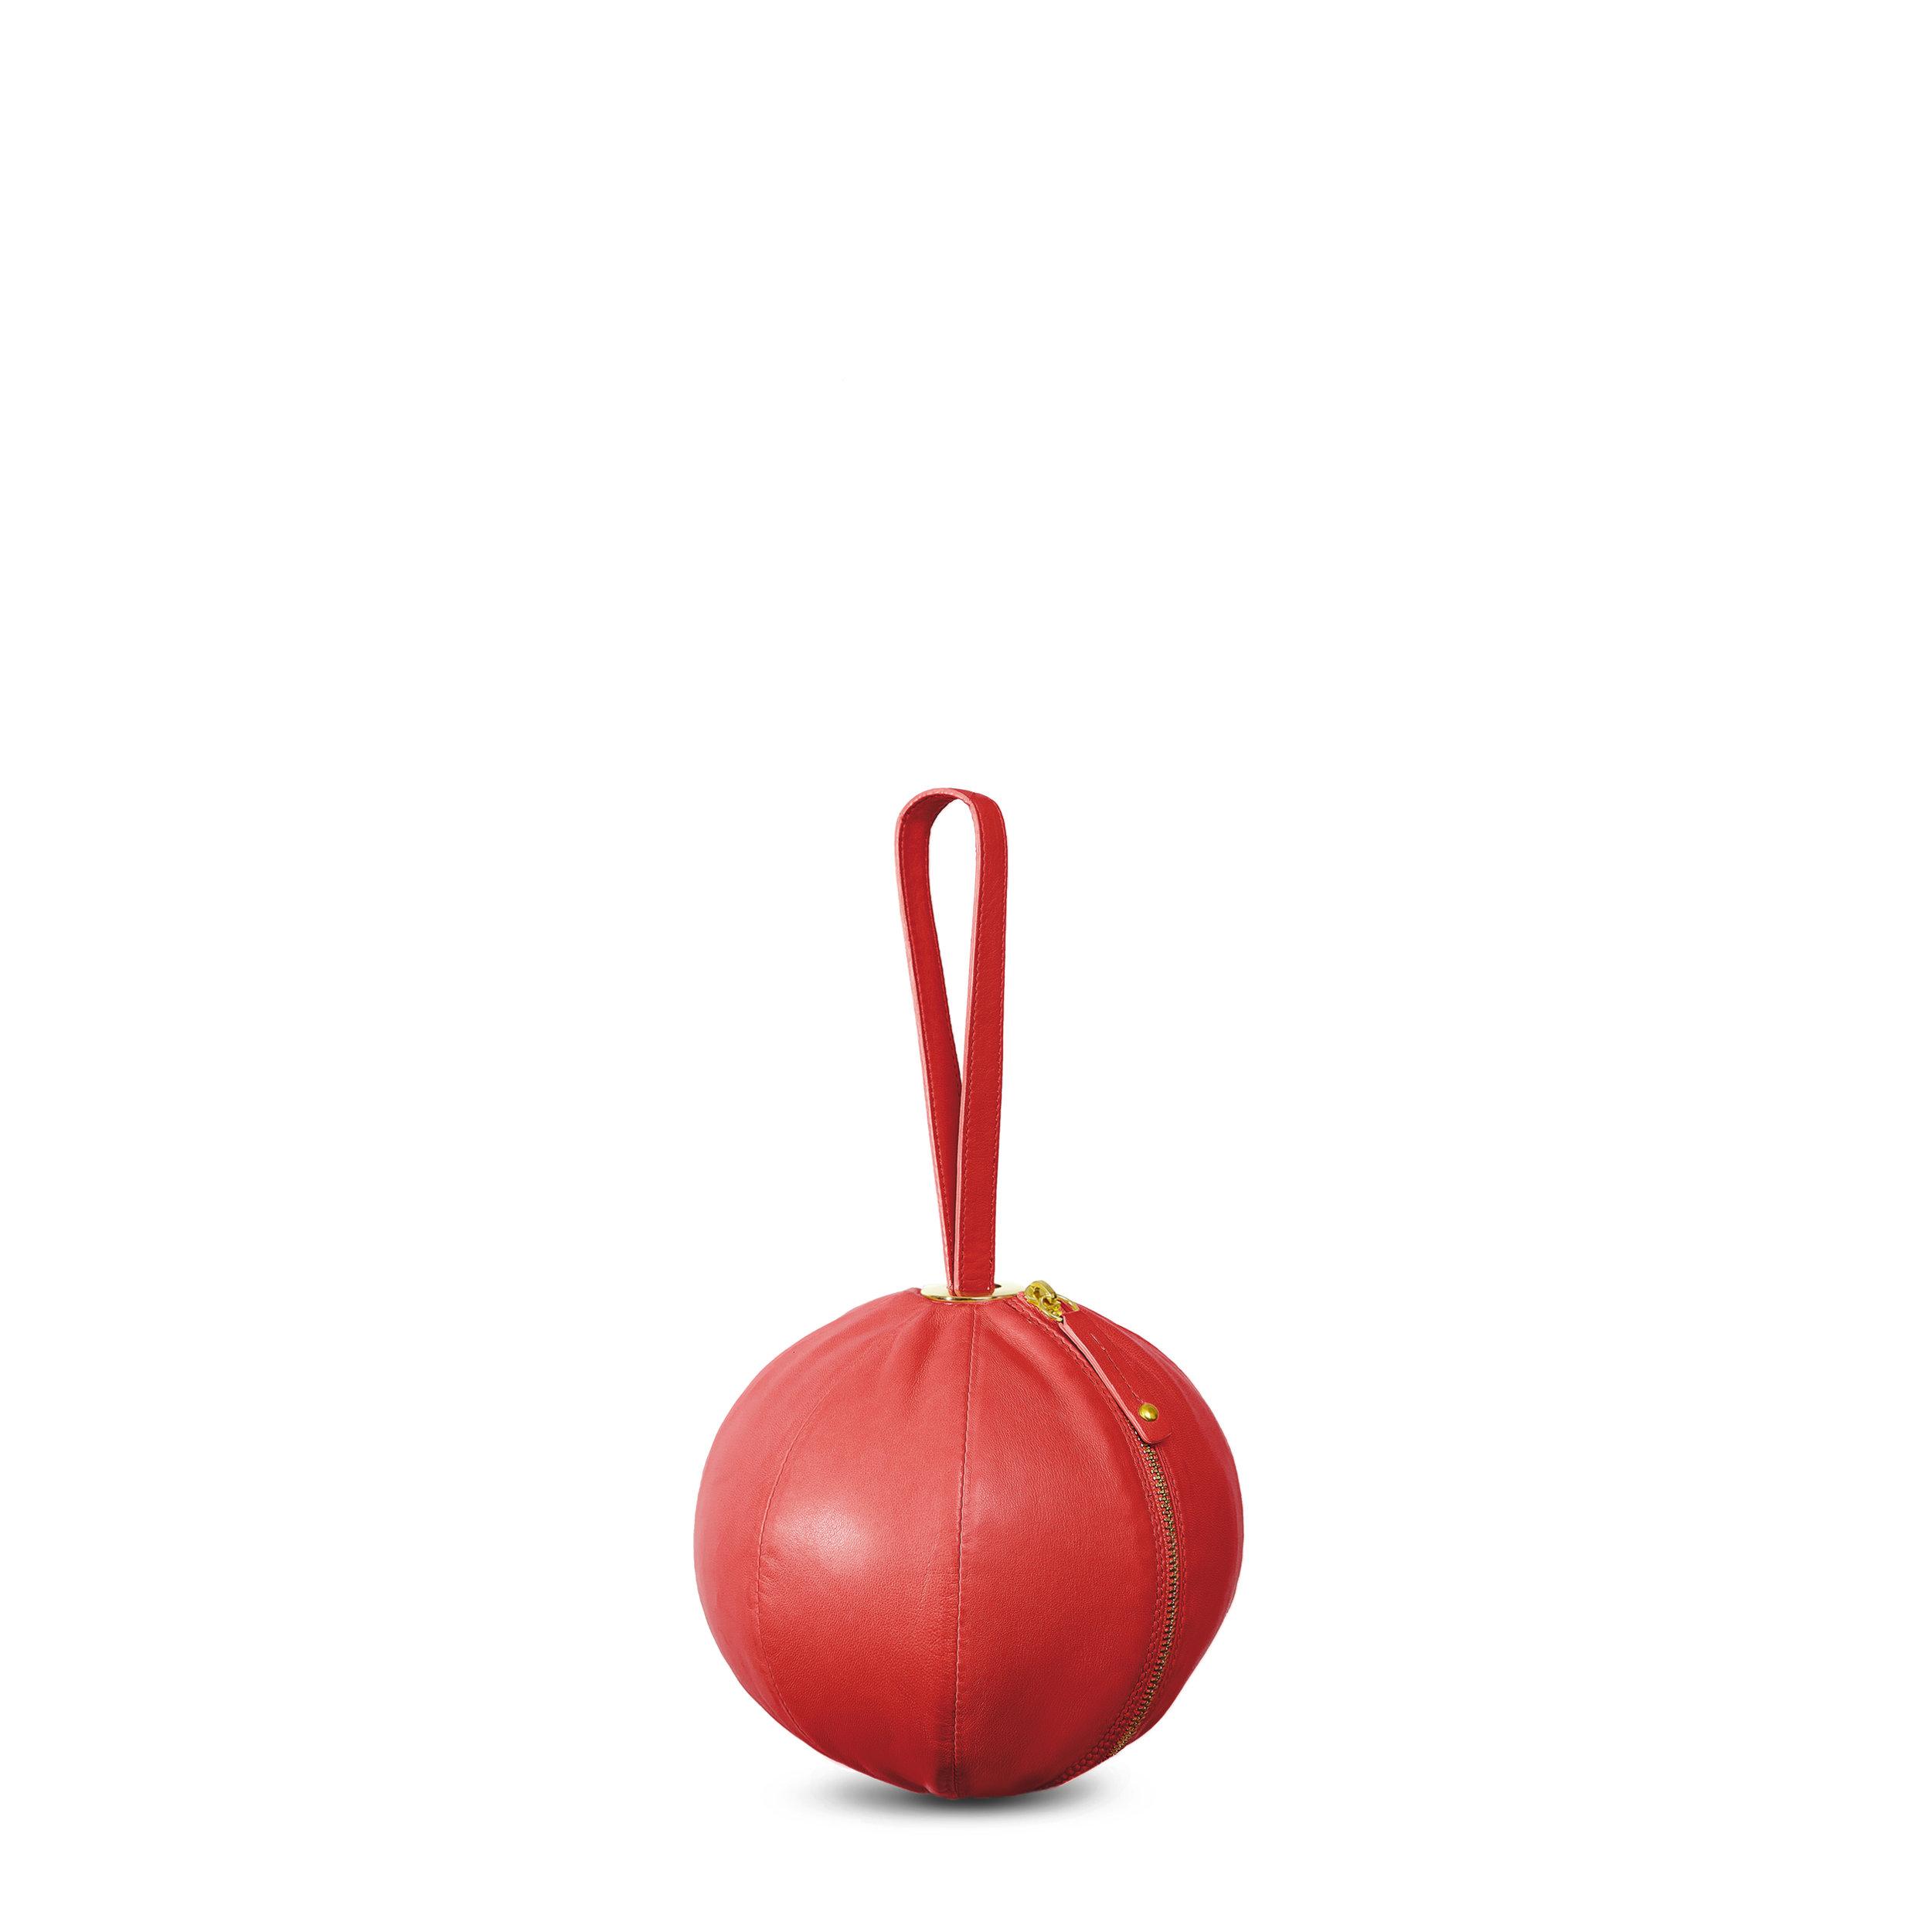 BALLOON WRIST rouge-BEA BUEHLER.jpg